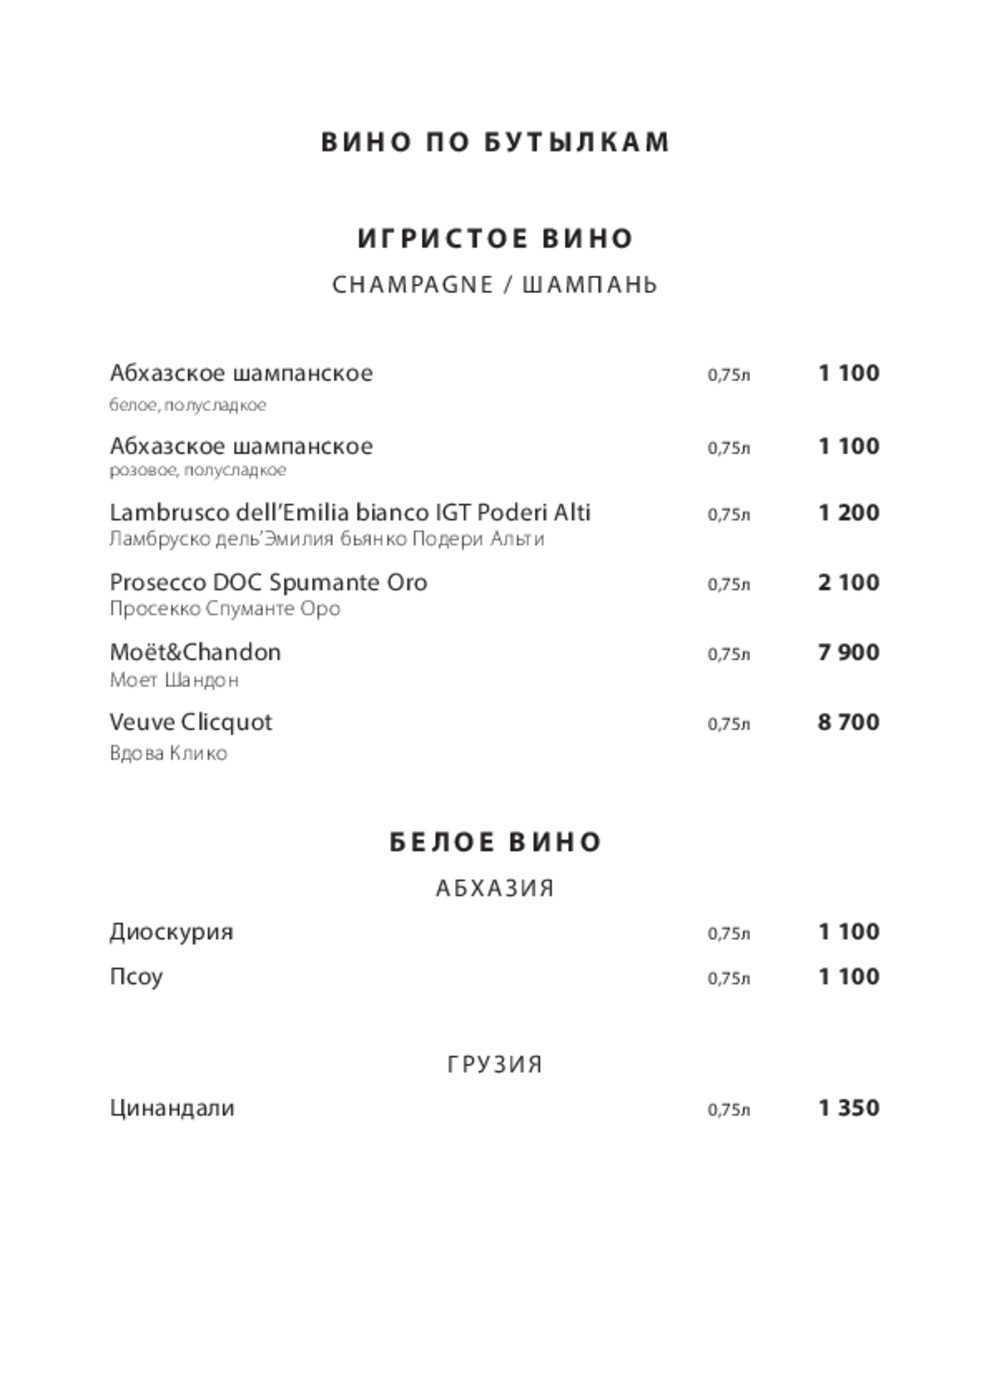 Меню ресторана Ача-Чача на Ленинградском проспекте